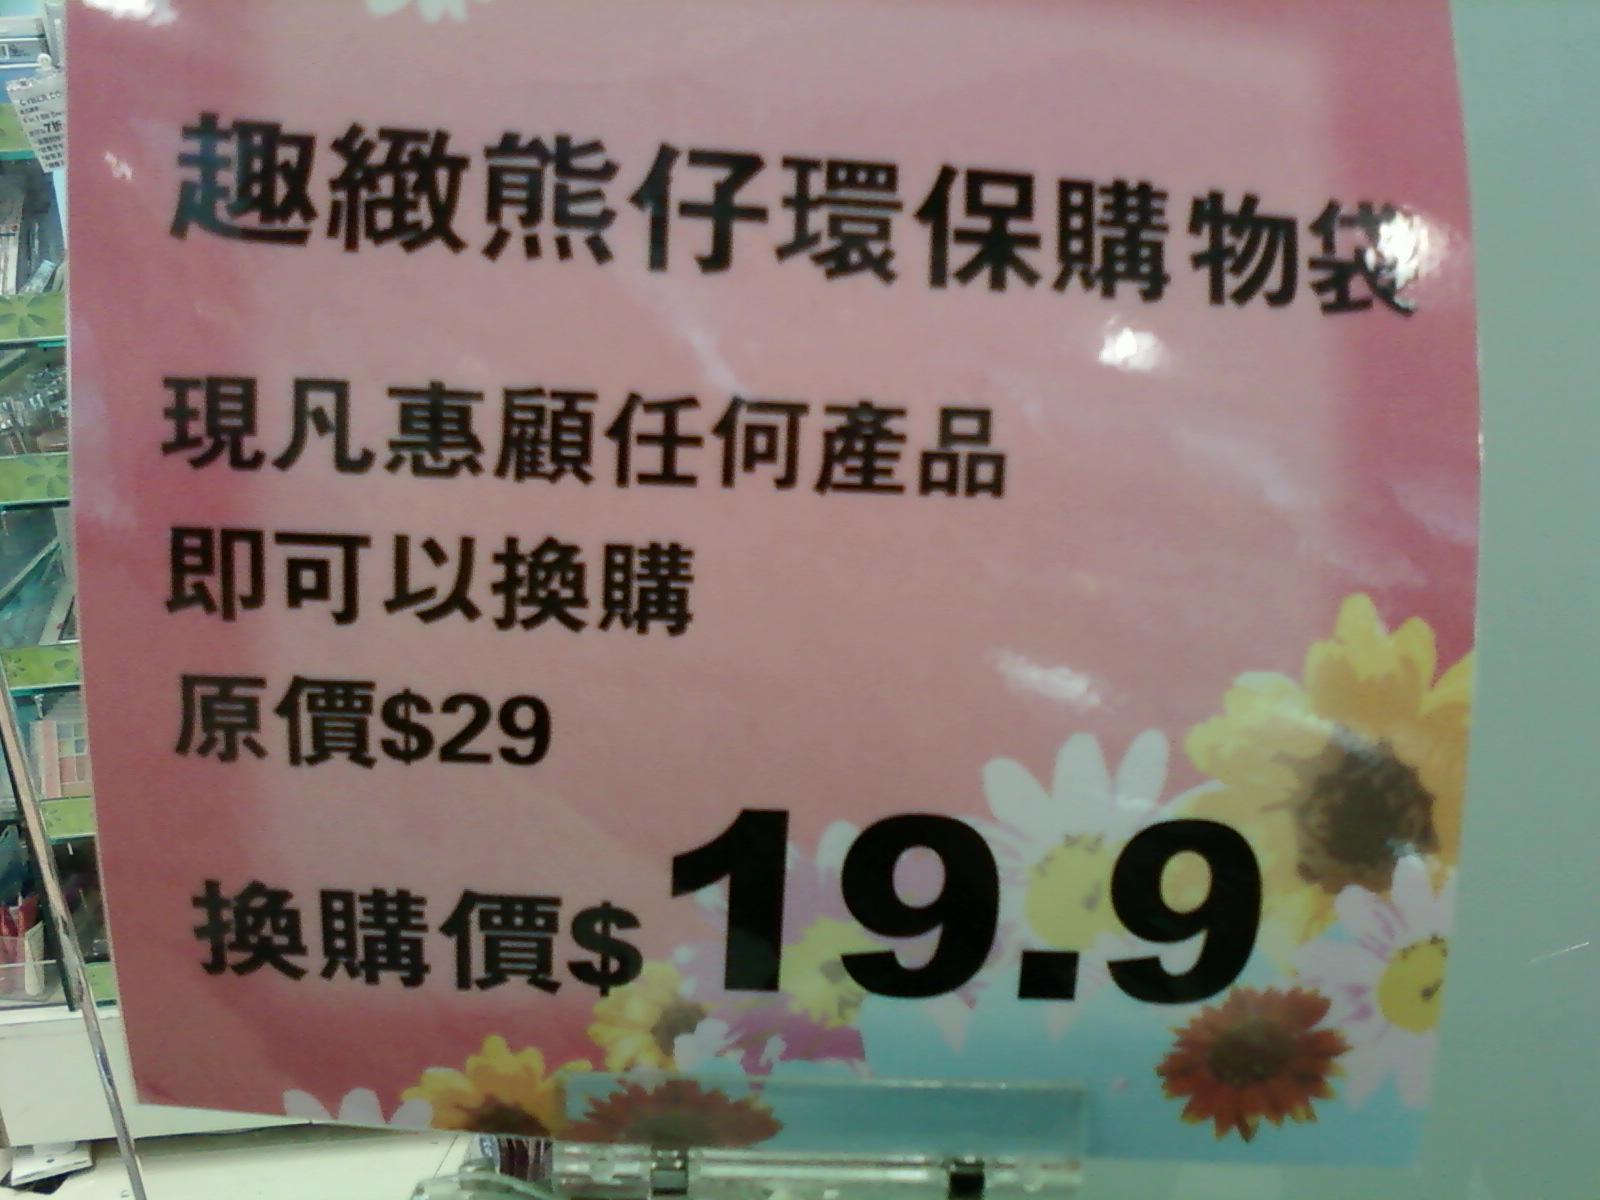 shopping bag promotion sign